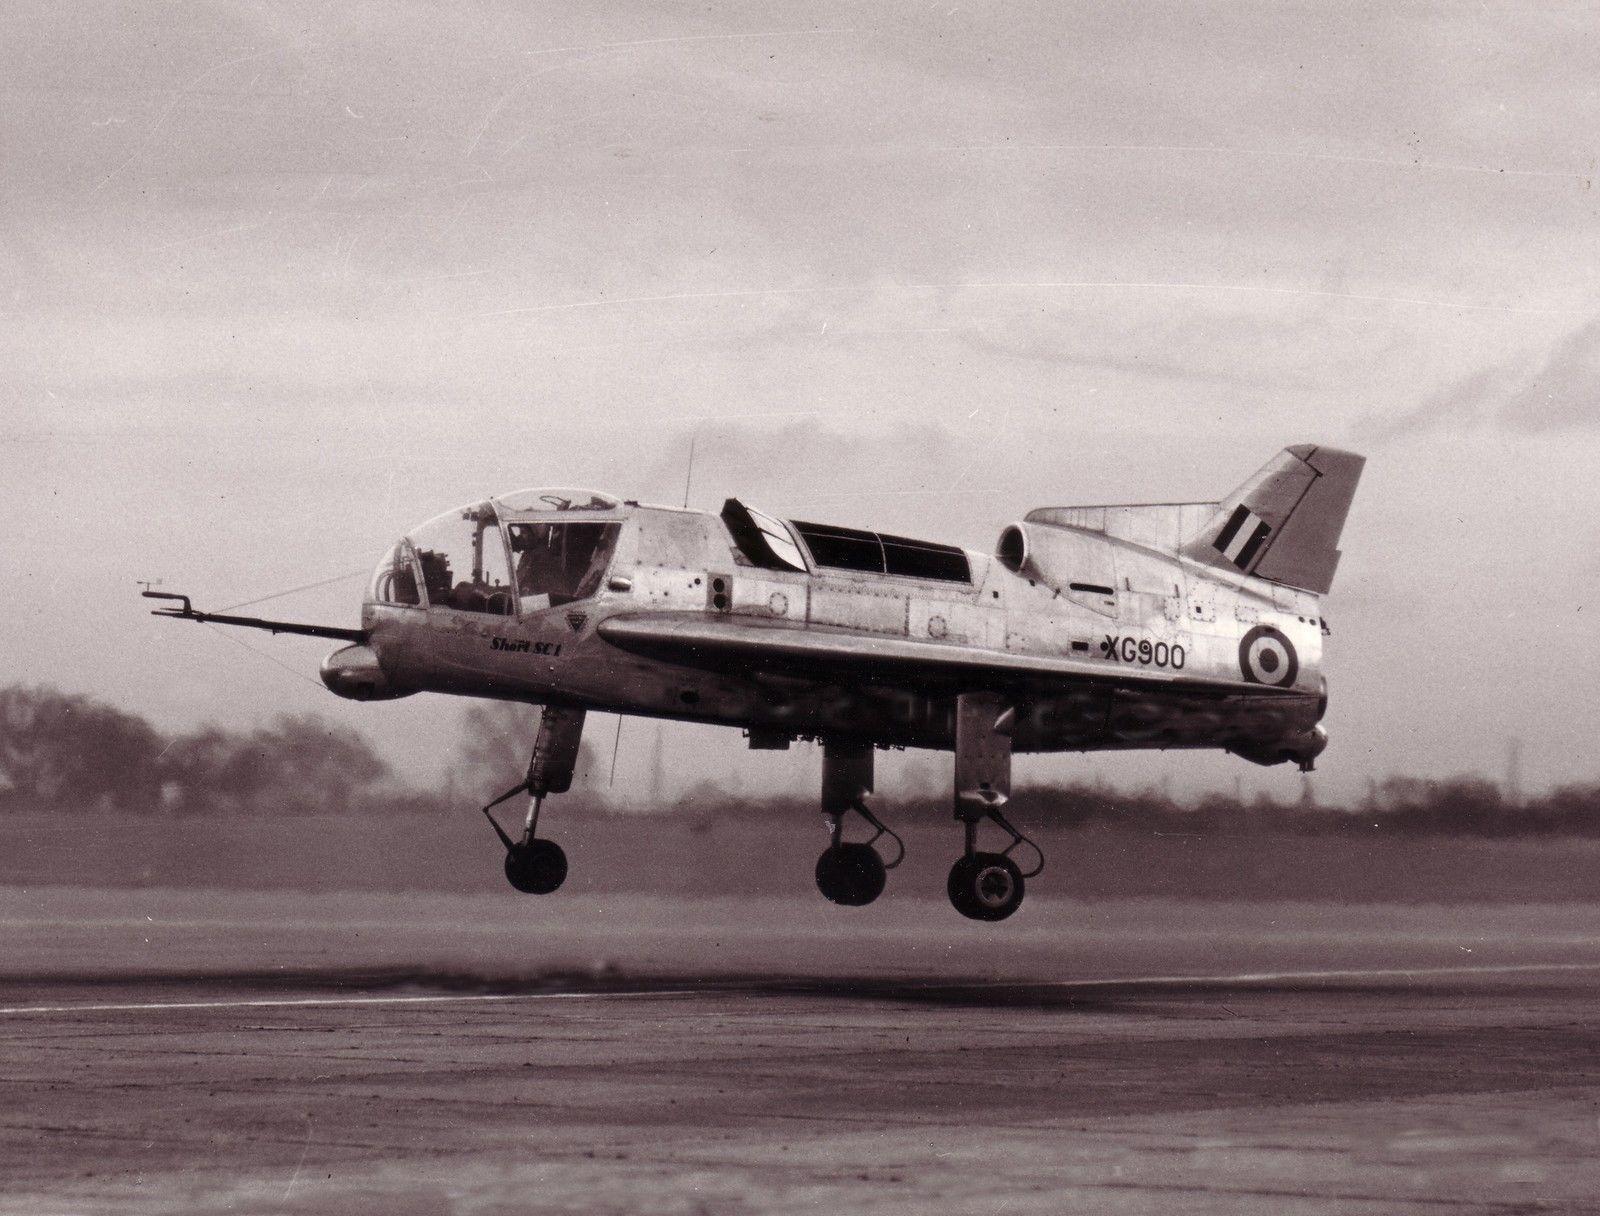 Shorts SC1 VTOL Aircraft Rolls Royce RB 108 Jet Engine RARE Harrier forerunner | eBay